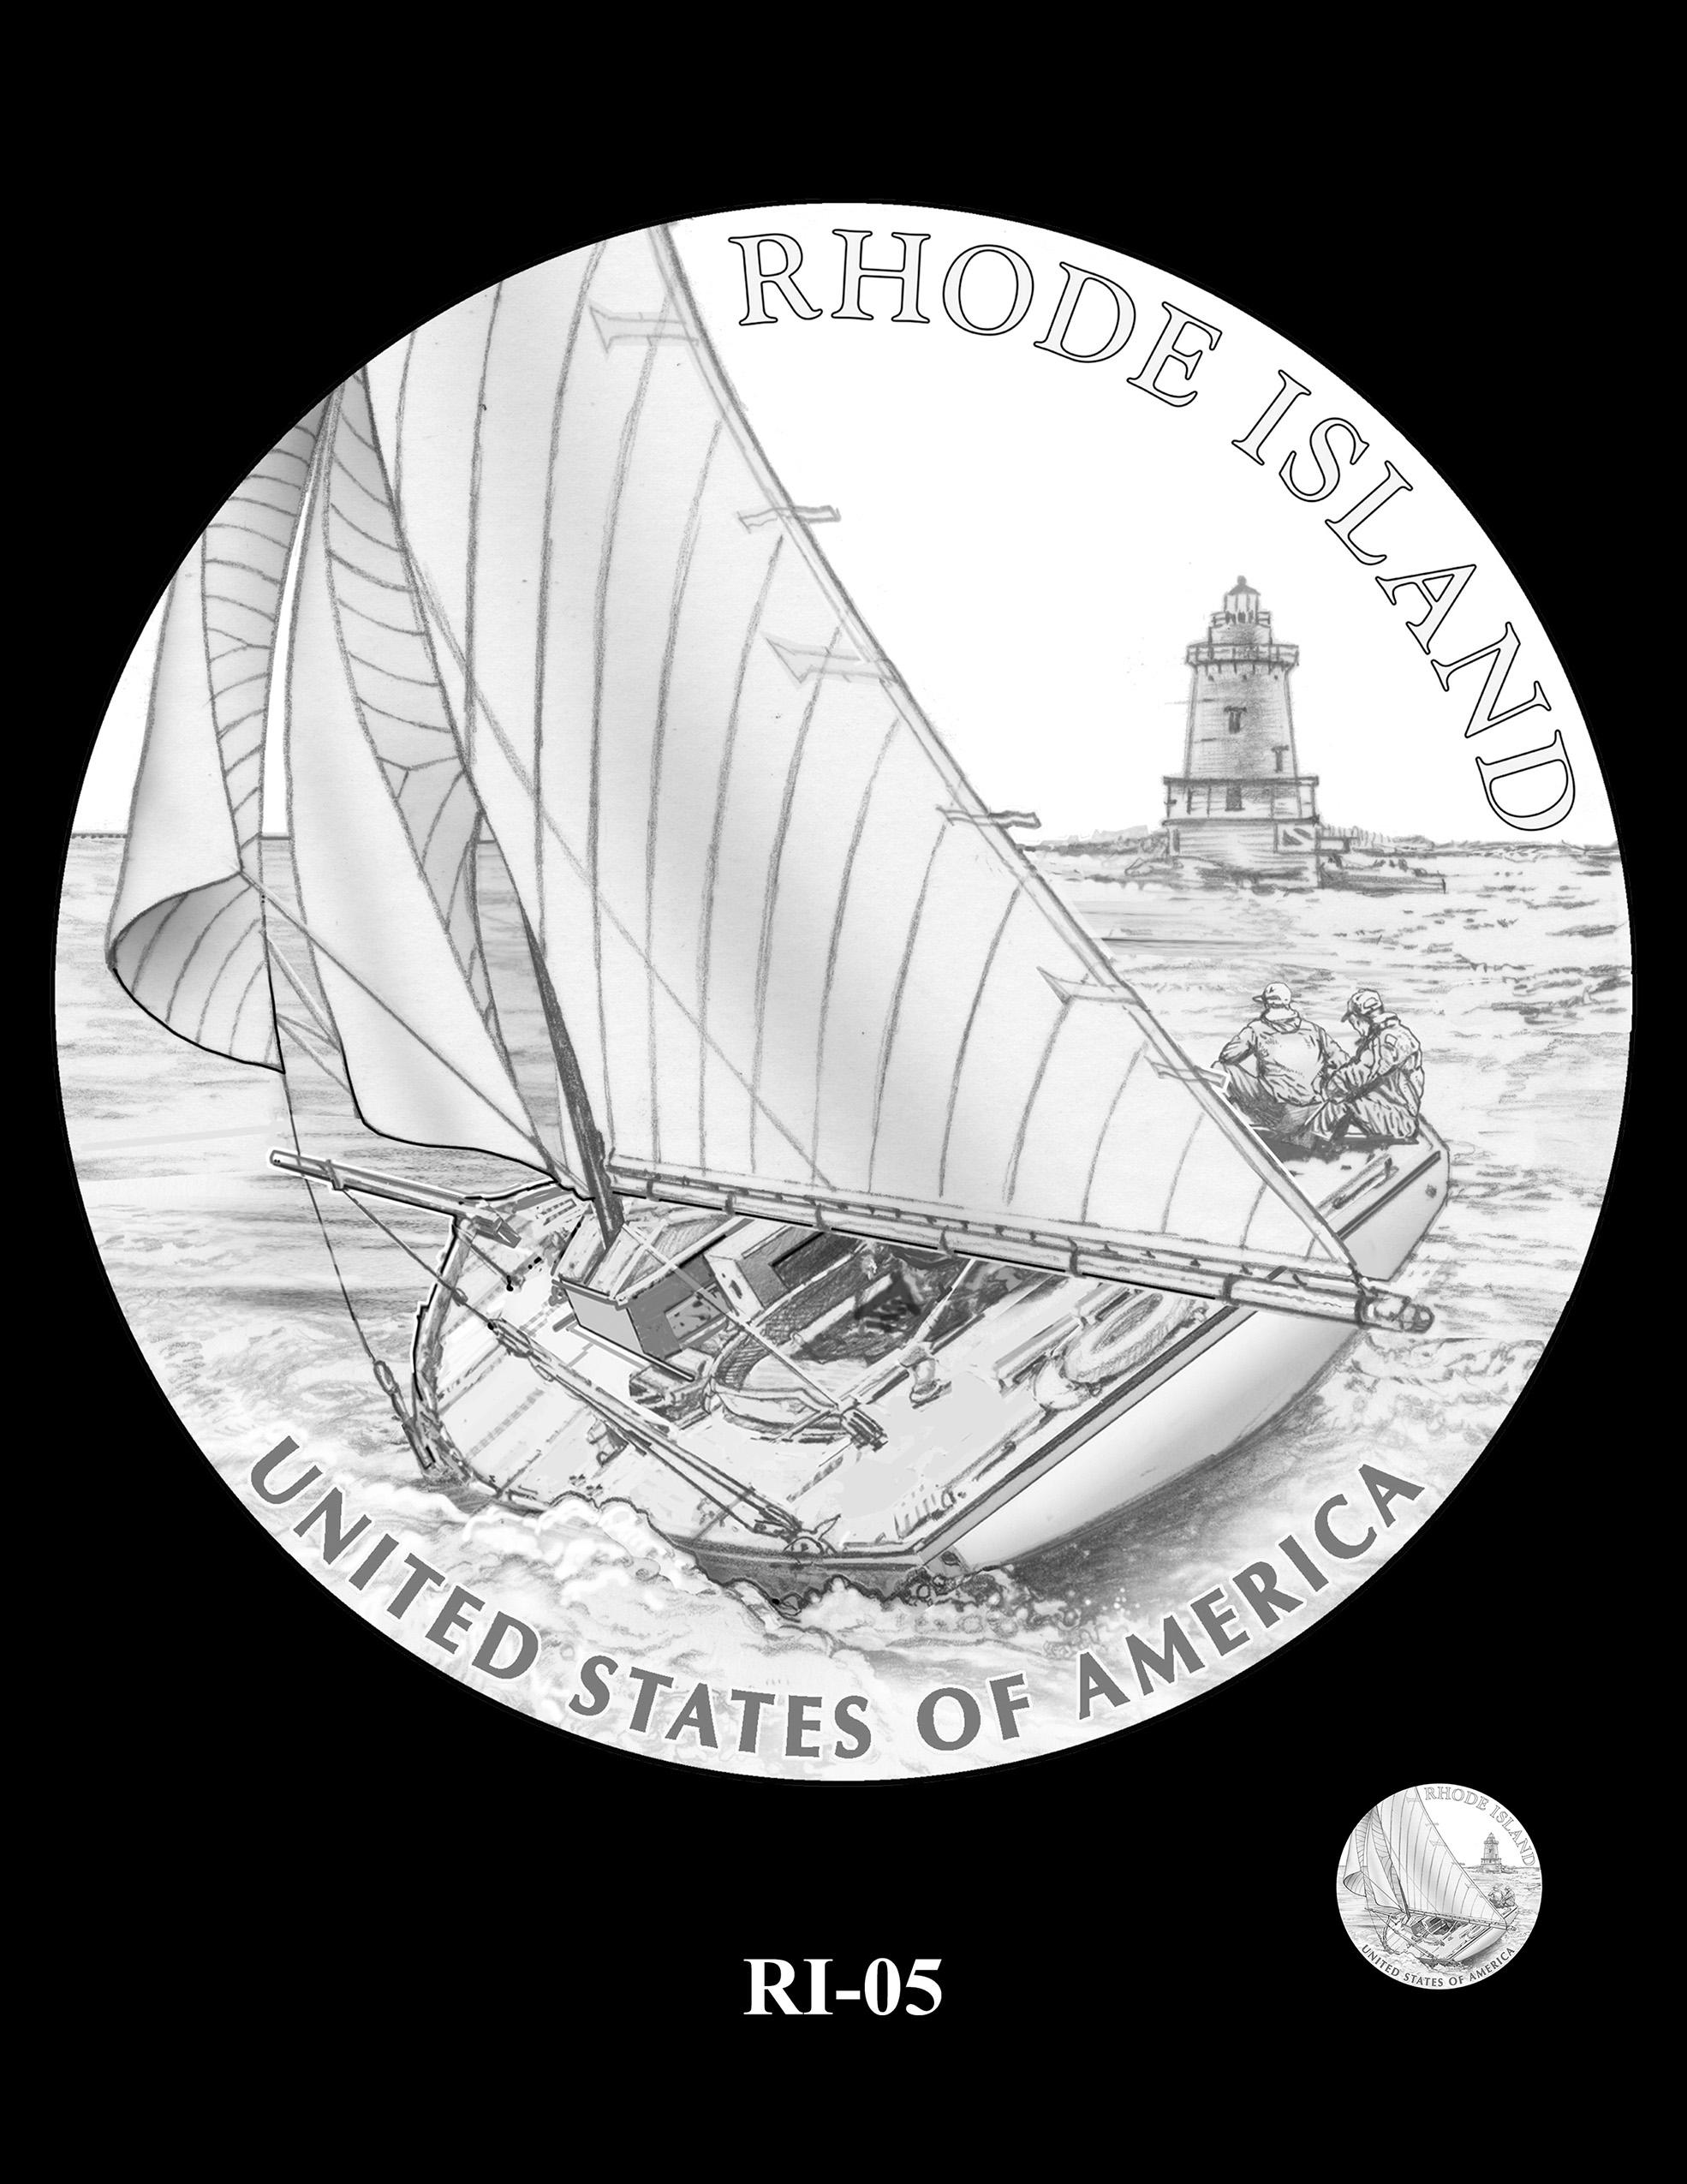 RI-05 -- 2022 American Innovation $1 Coin - Rhode Island